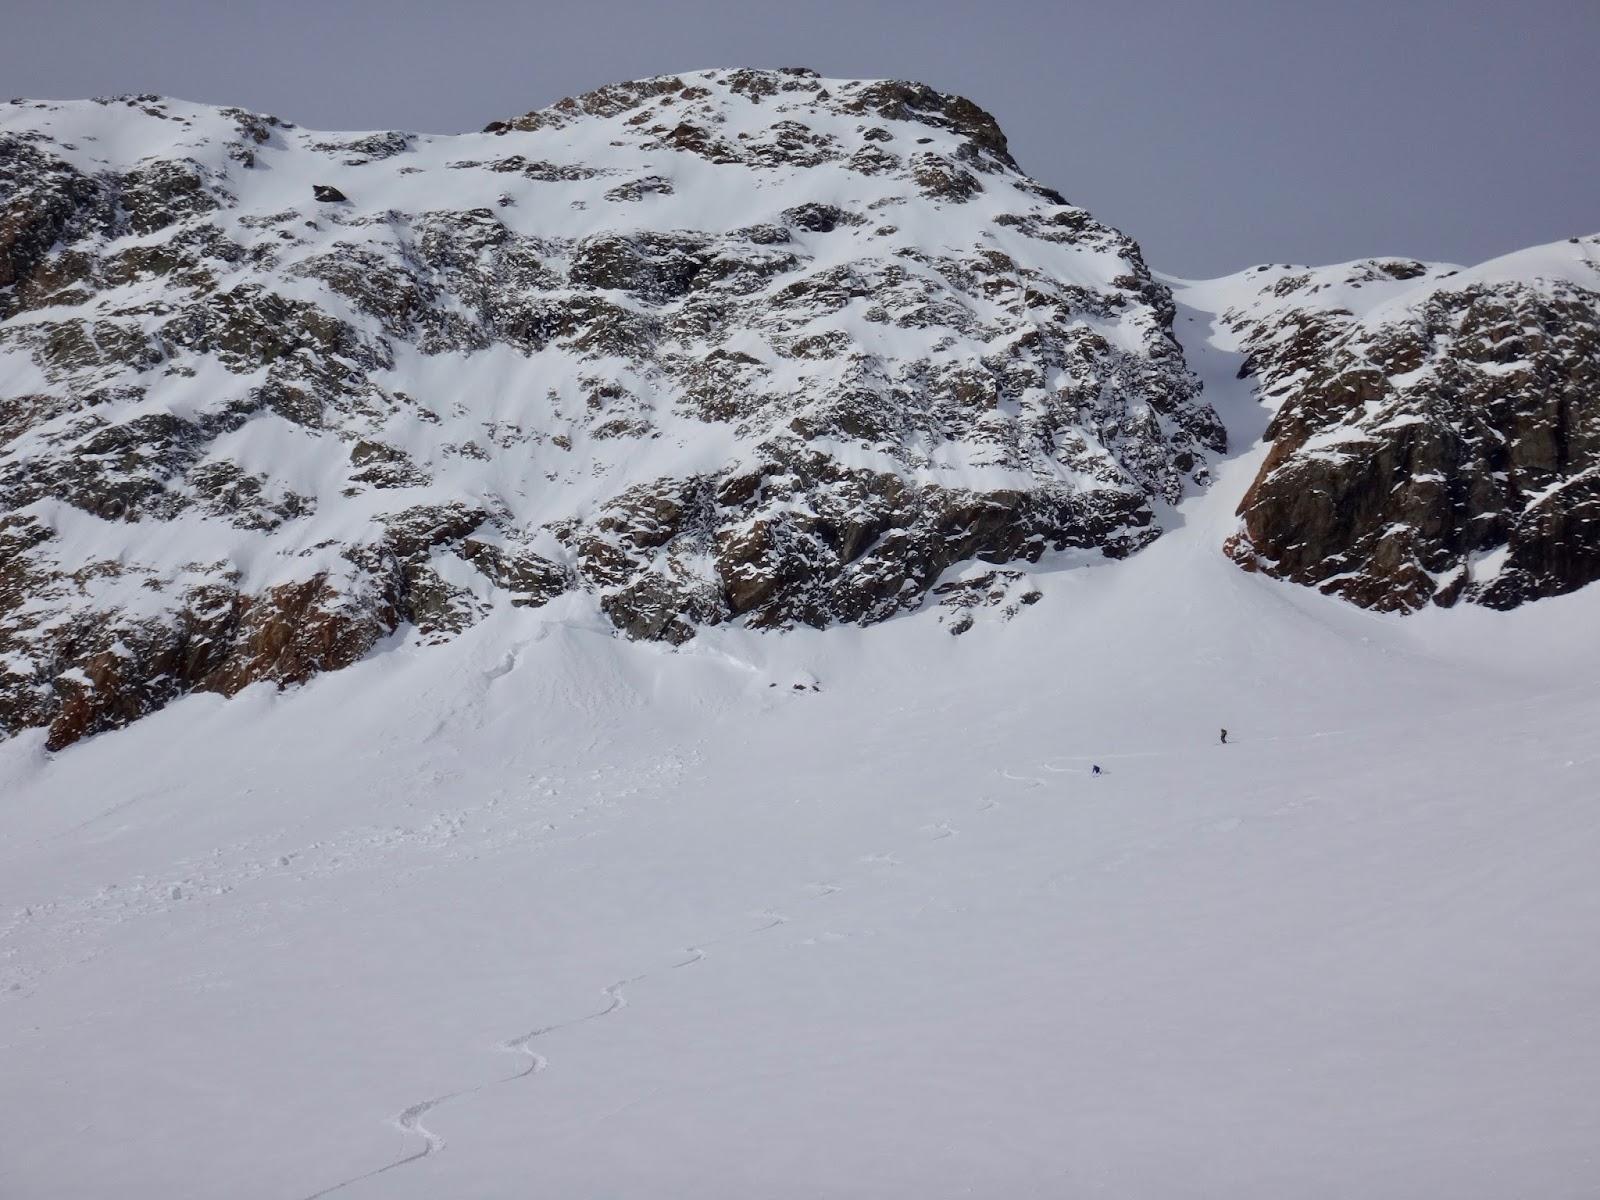 Quentin Delavignette Guide de haute montagne UIAGM: Grand ...